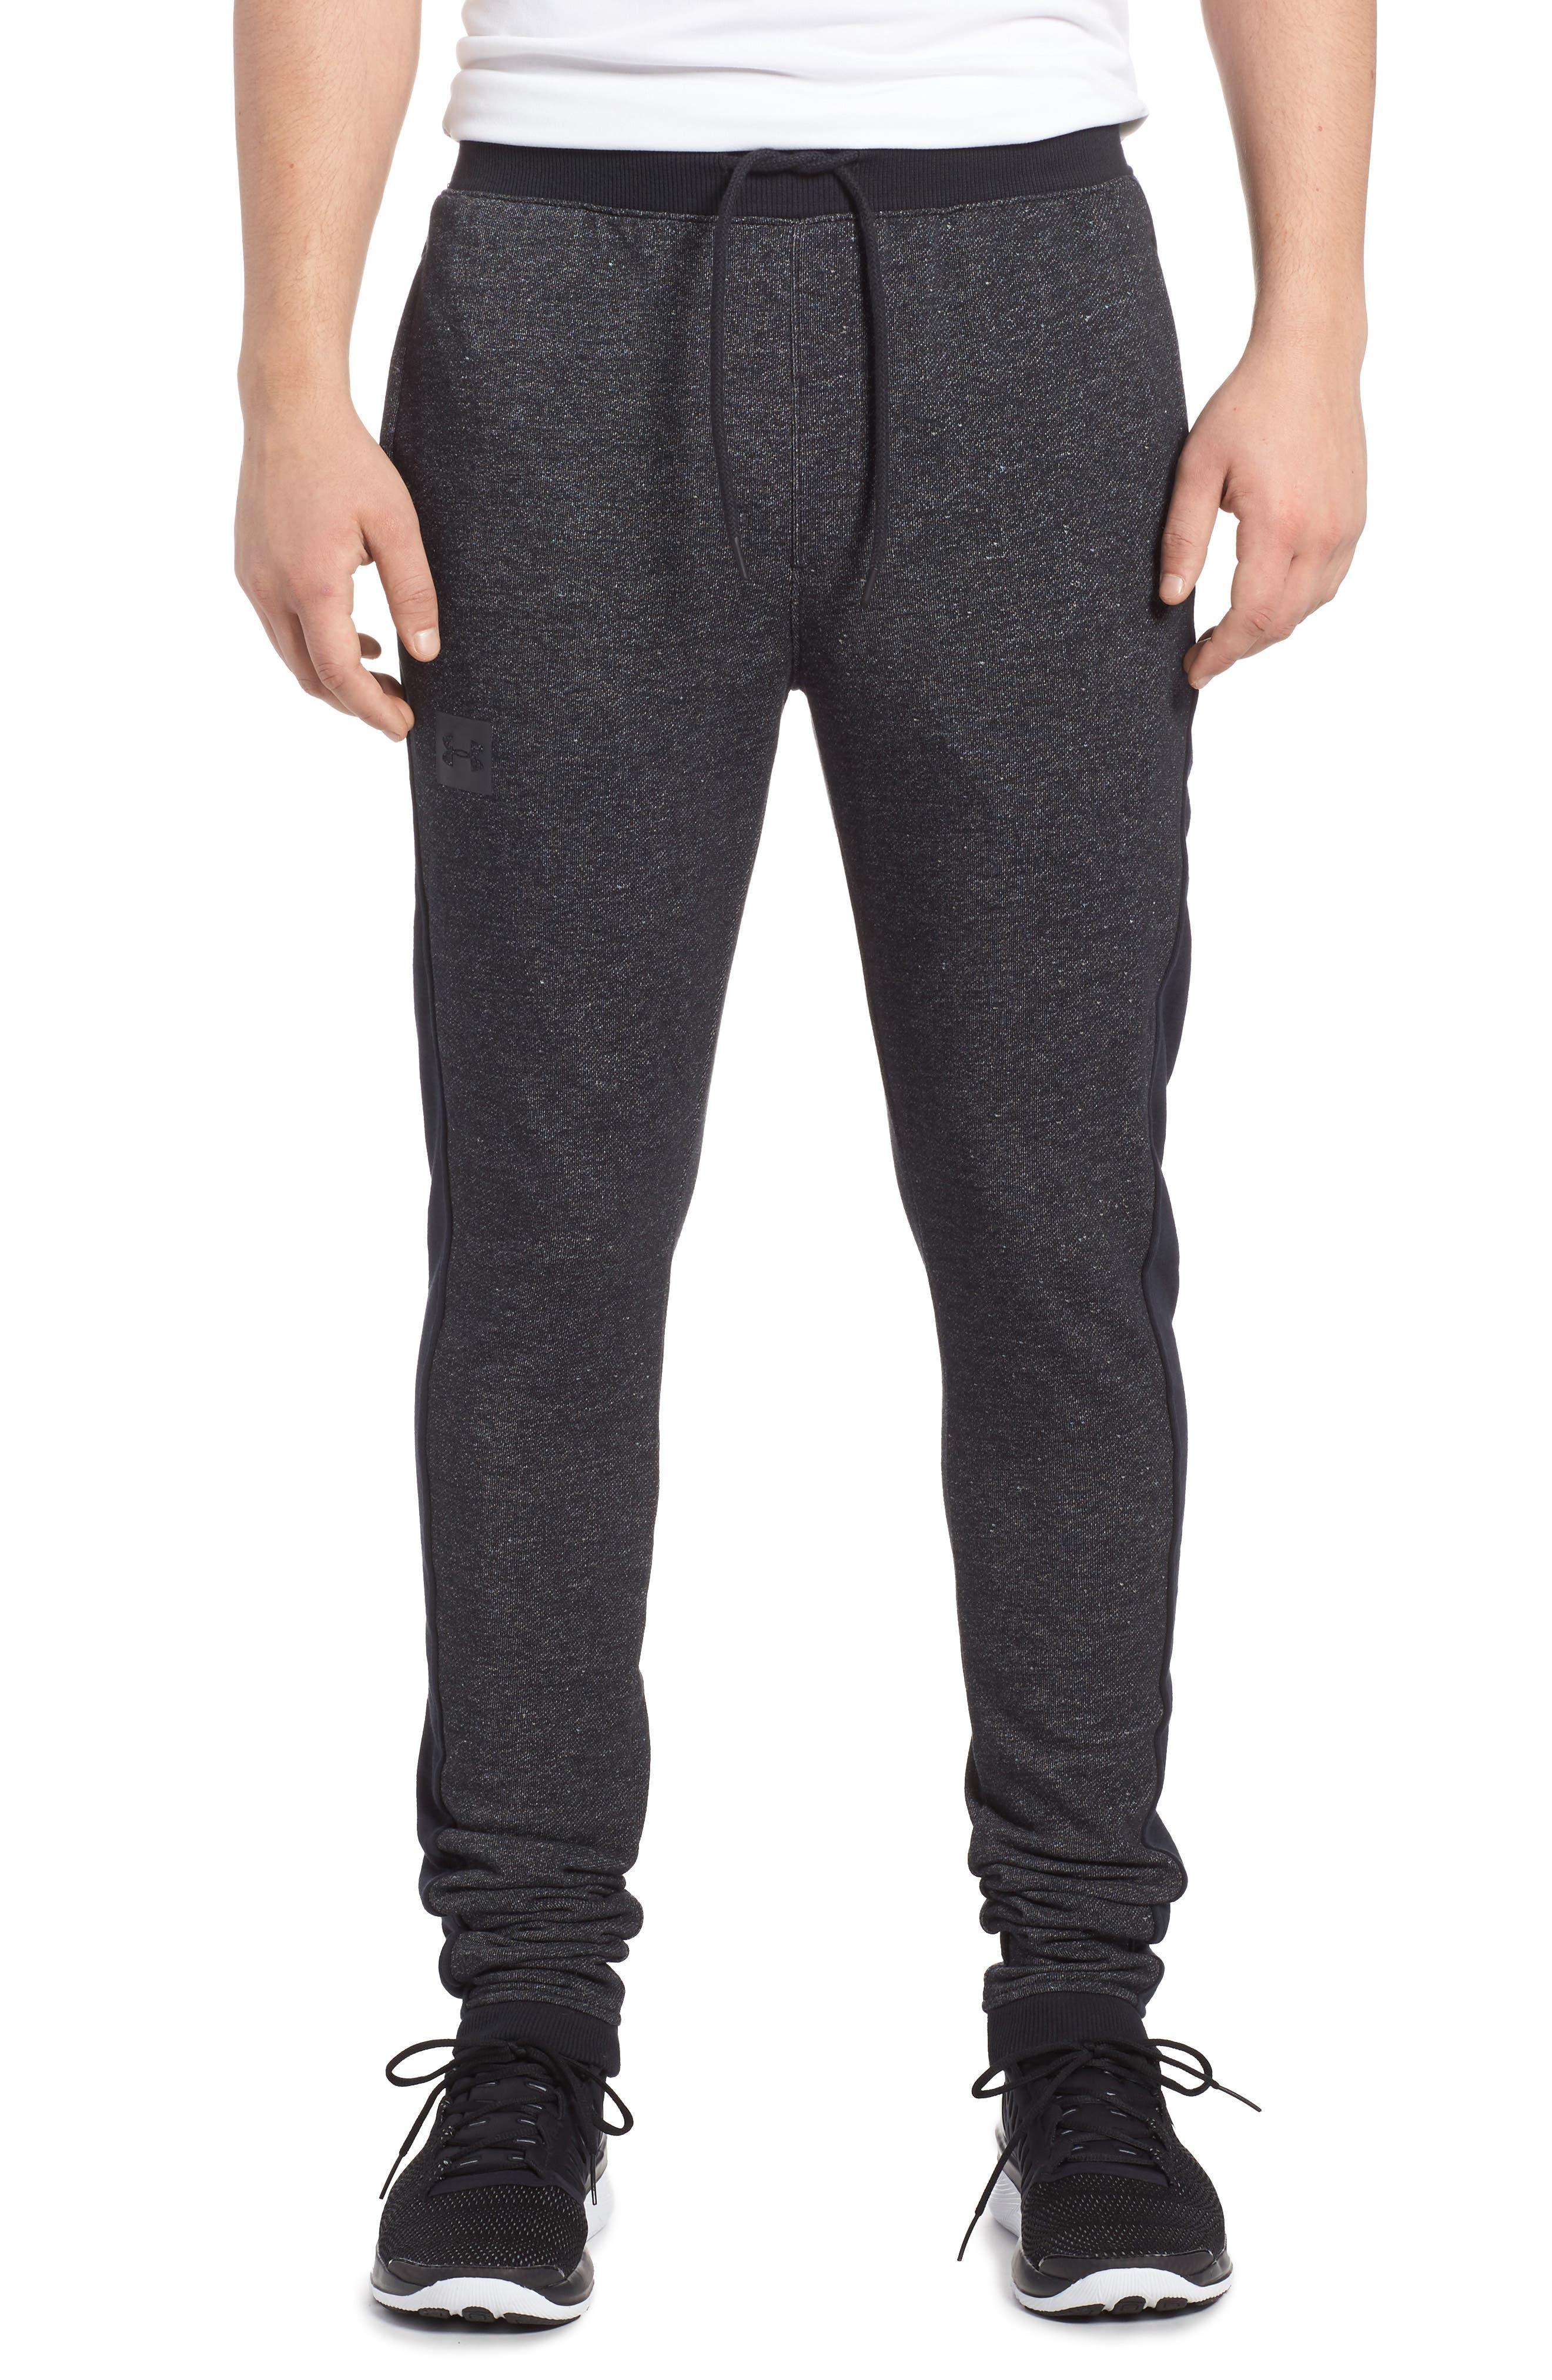 Sportstyle Fitted Fleece Leggings,                         Main,                         color, Black